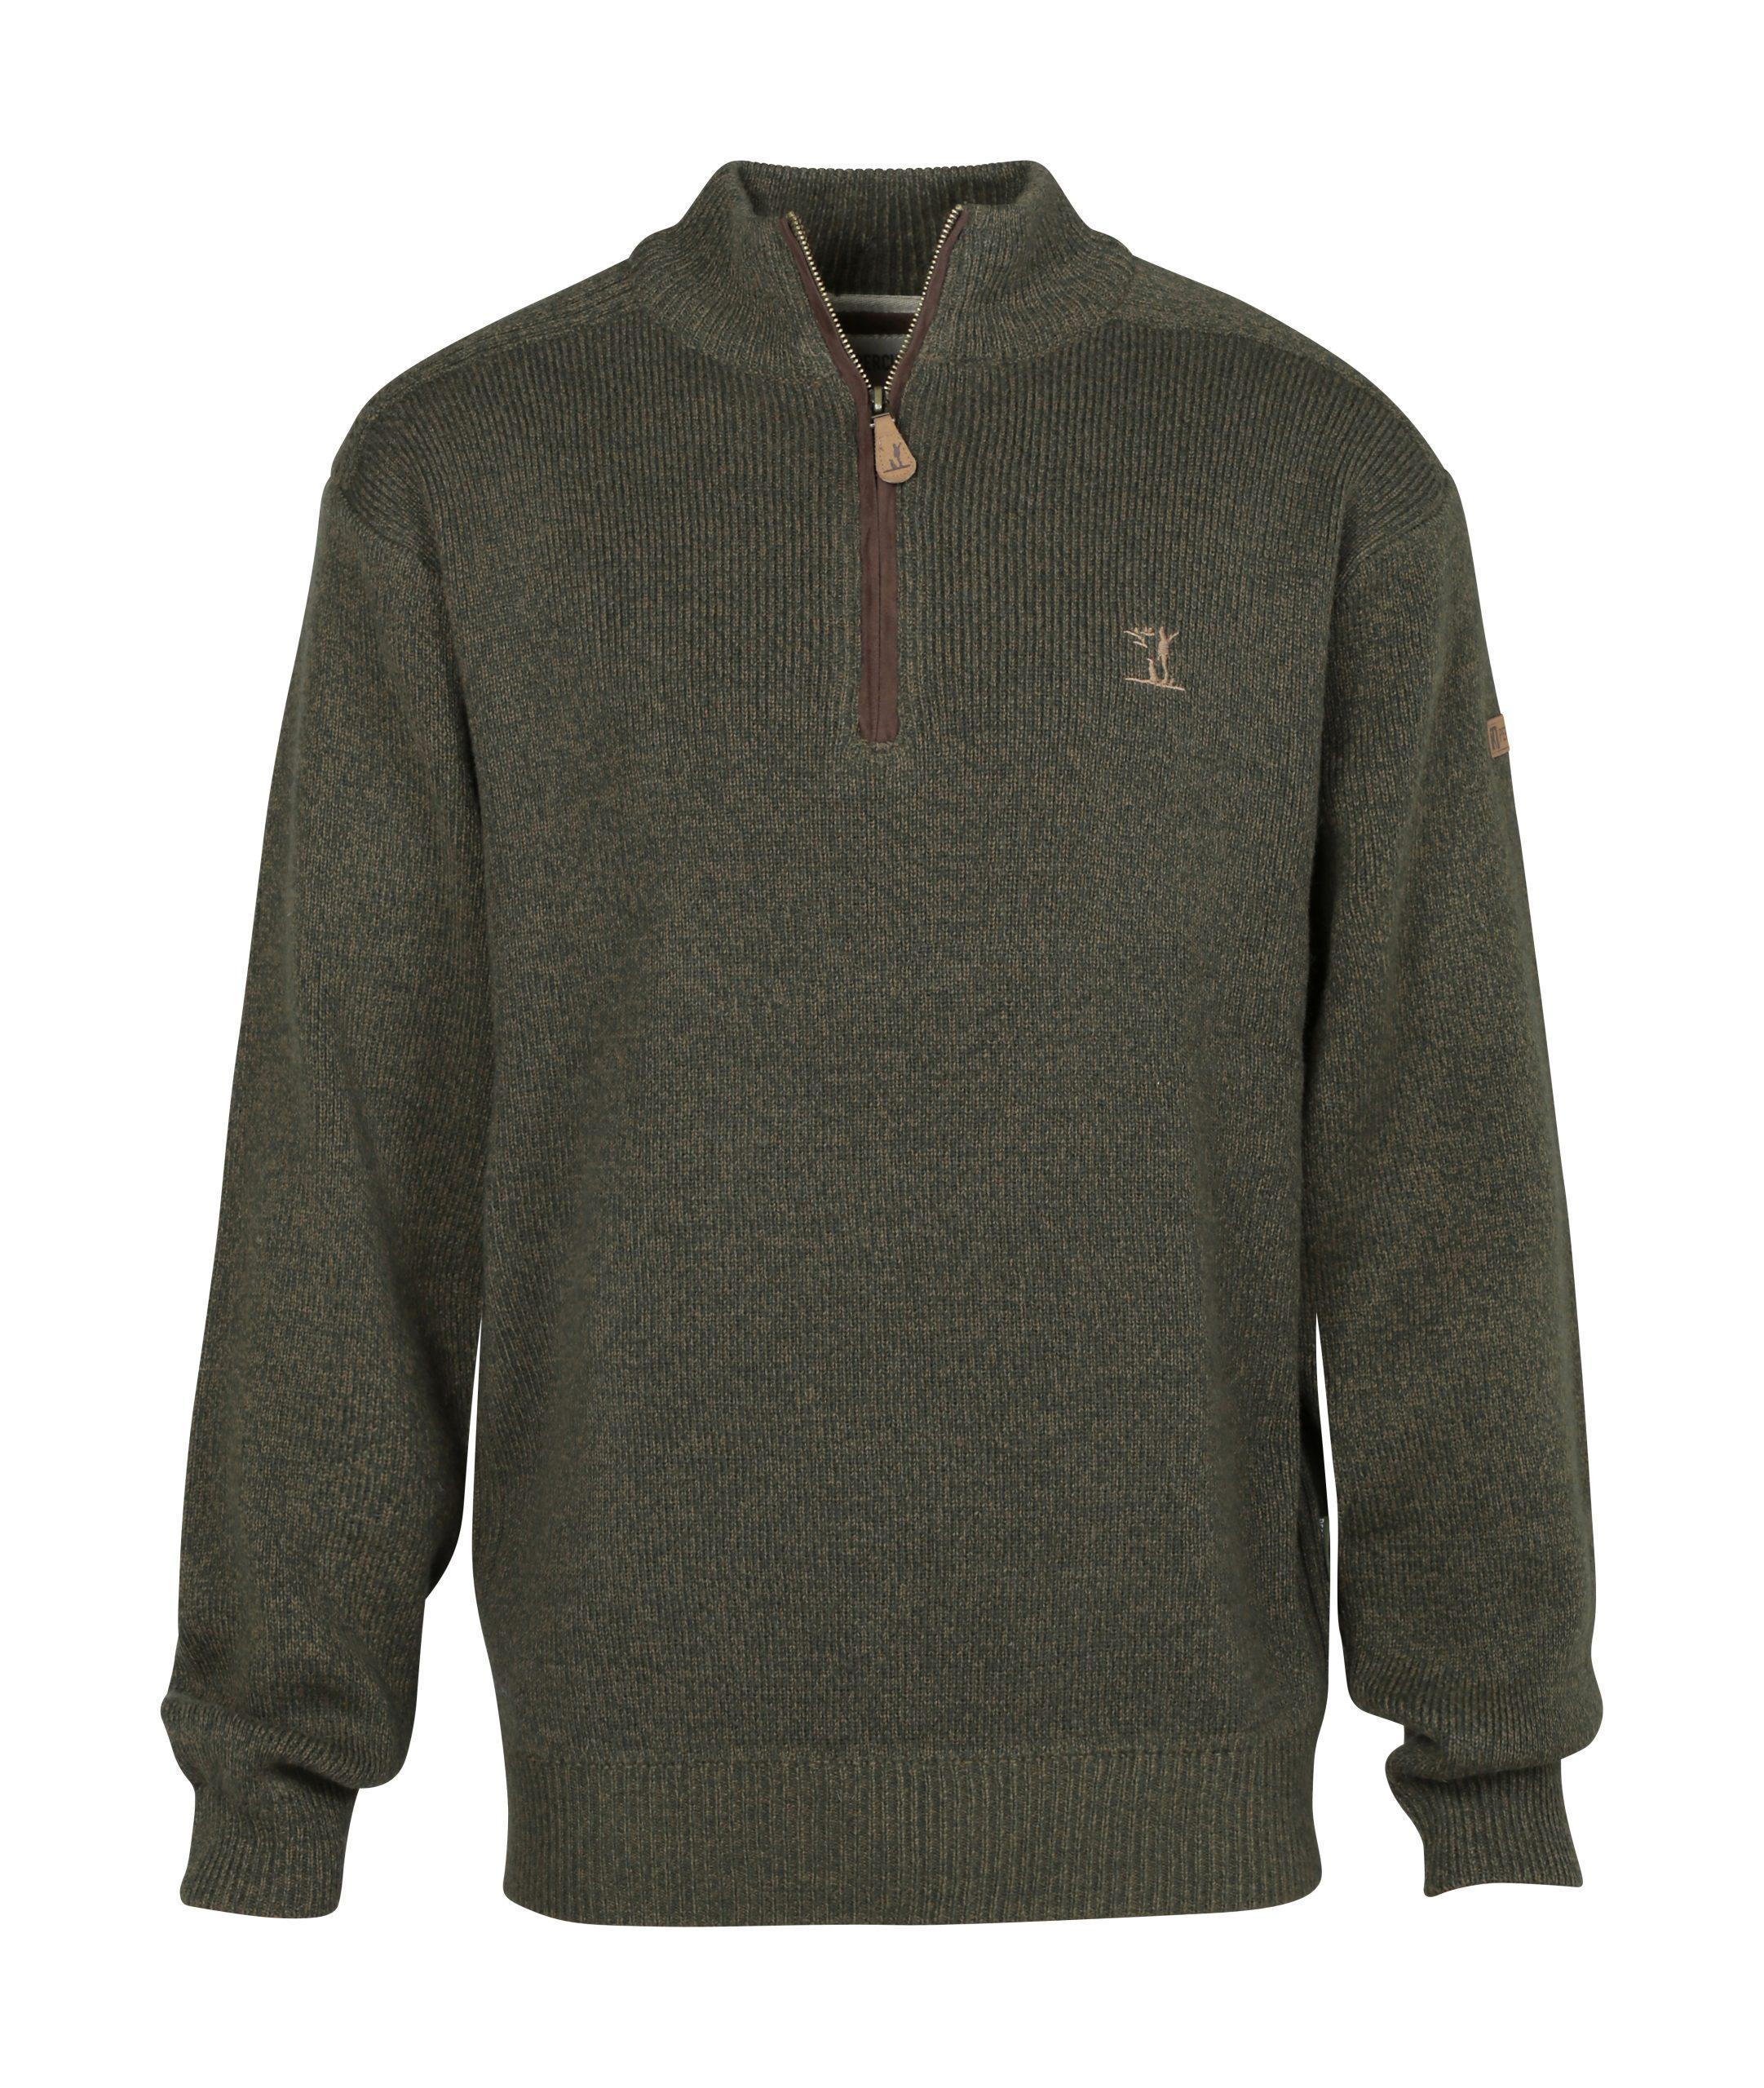 Percussion Zipped Sweatshirt Olive